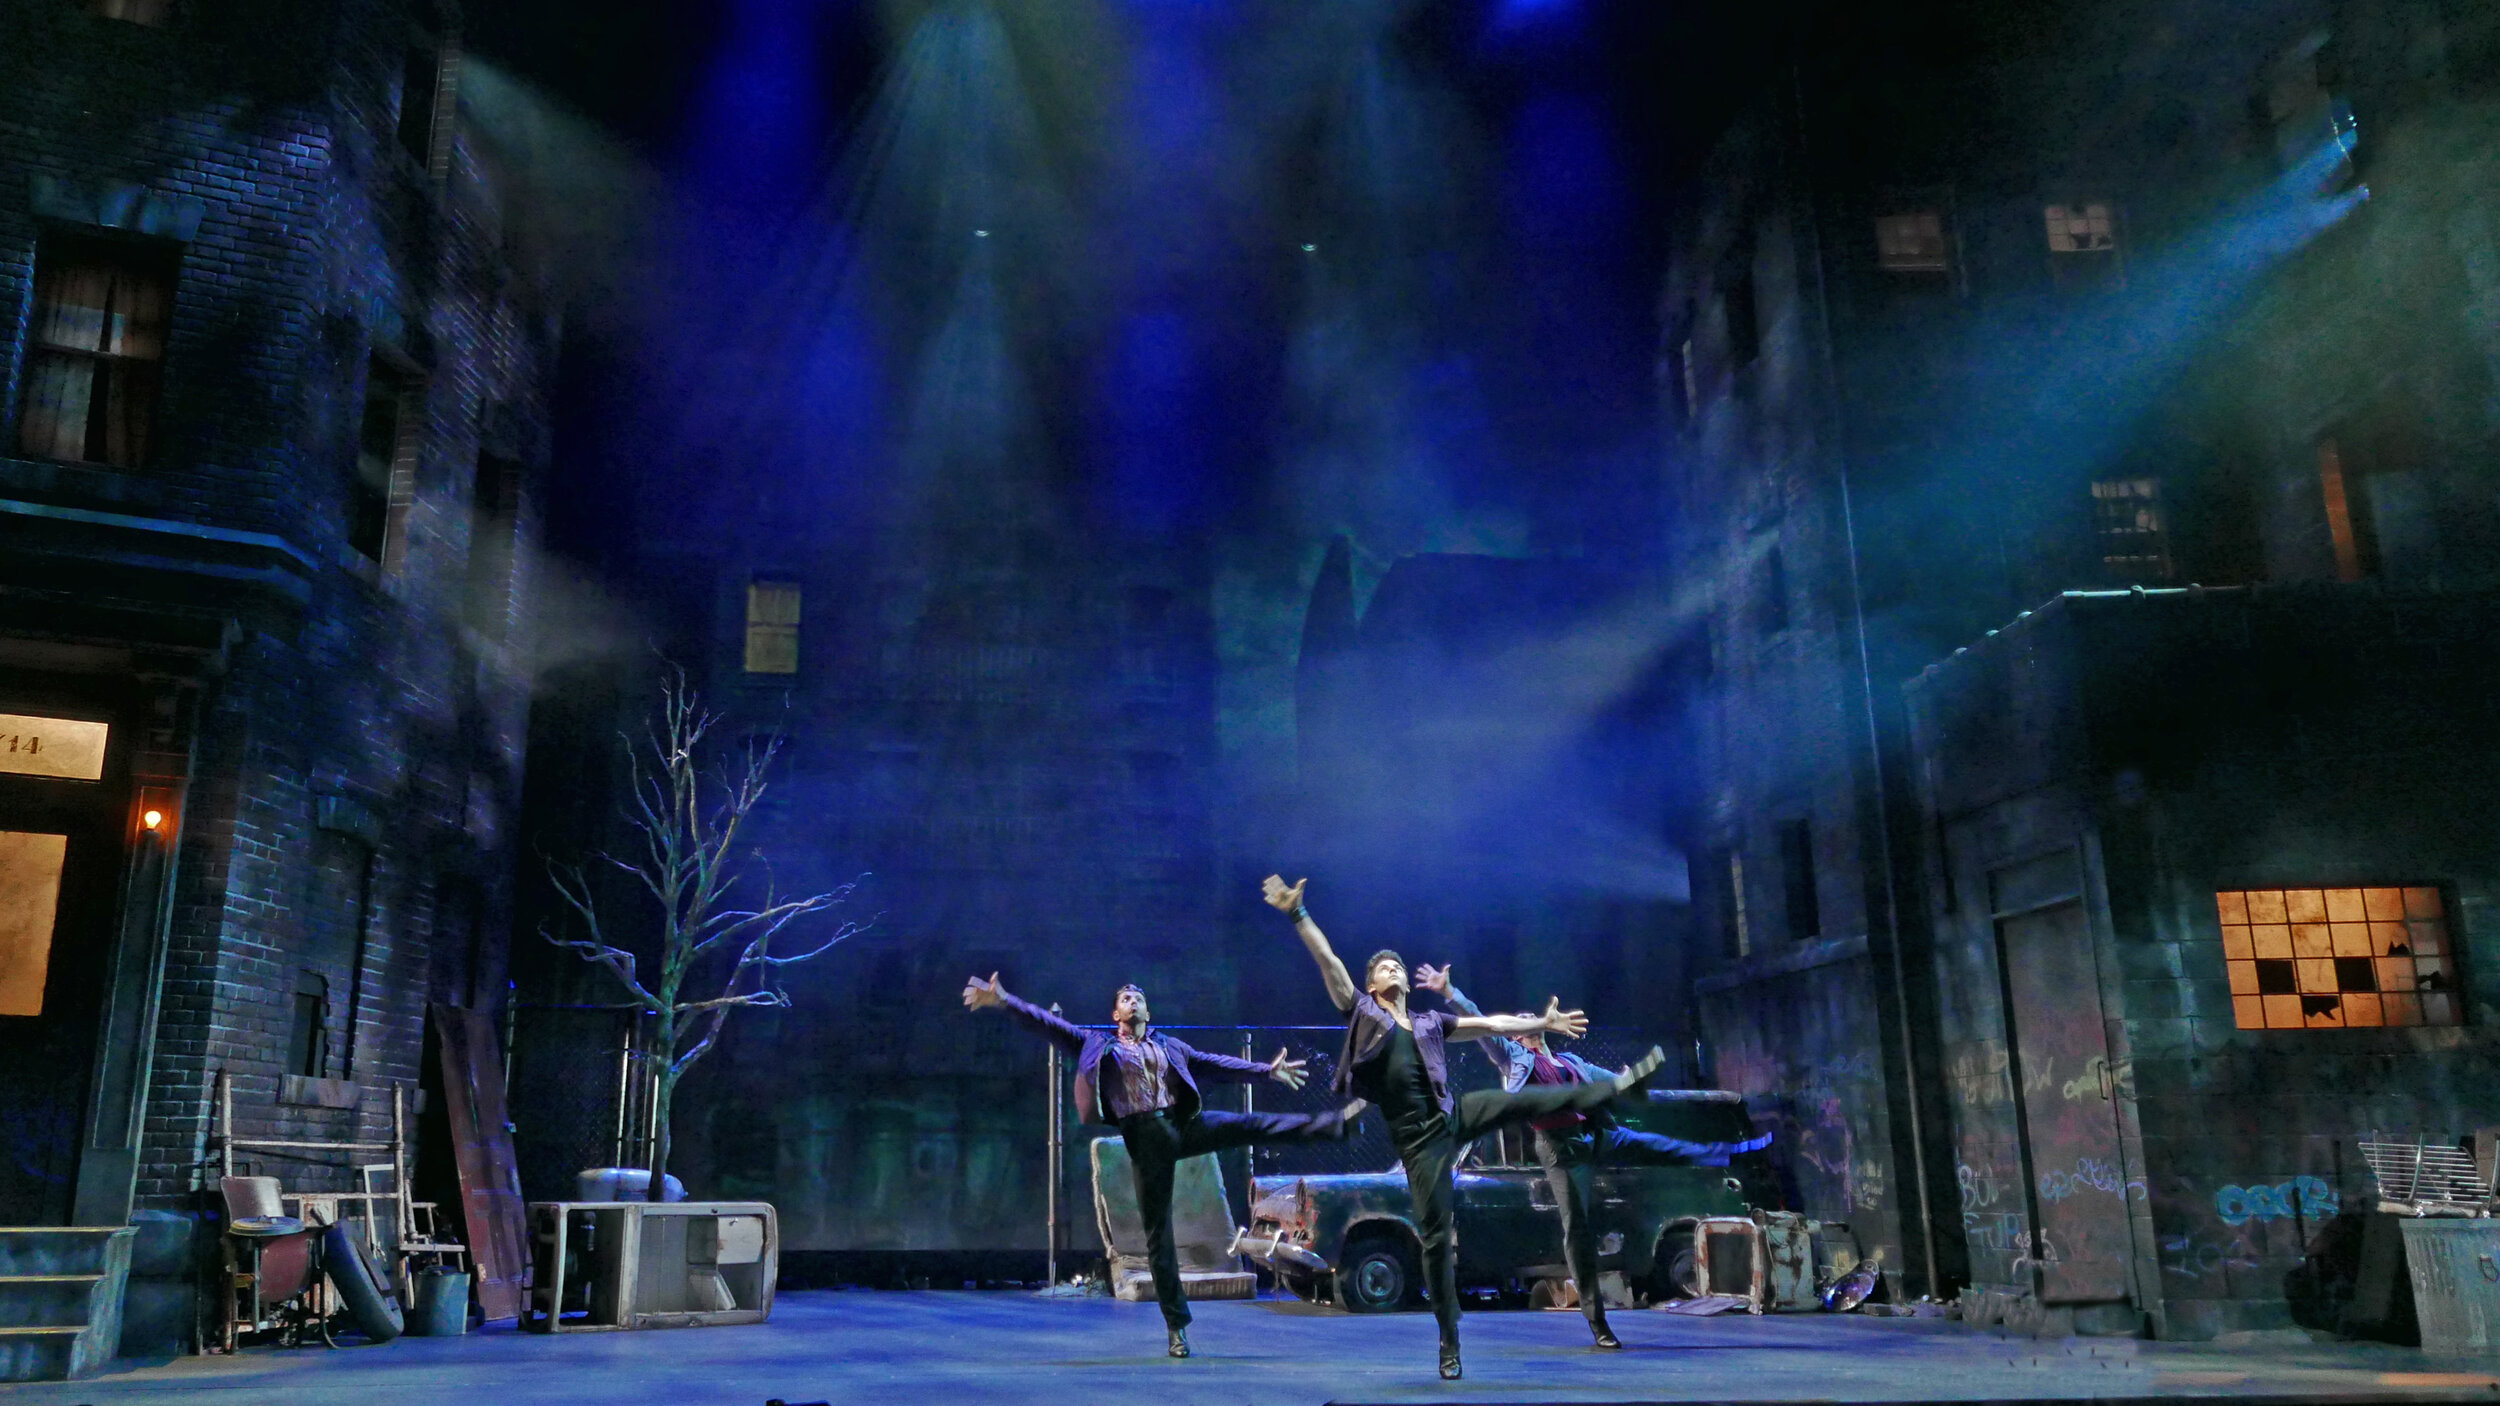 West Side Story - Tokyo 360 Stage Around